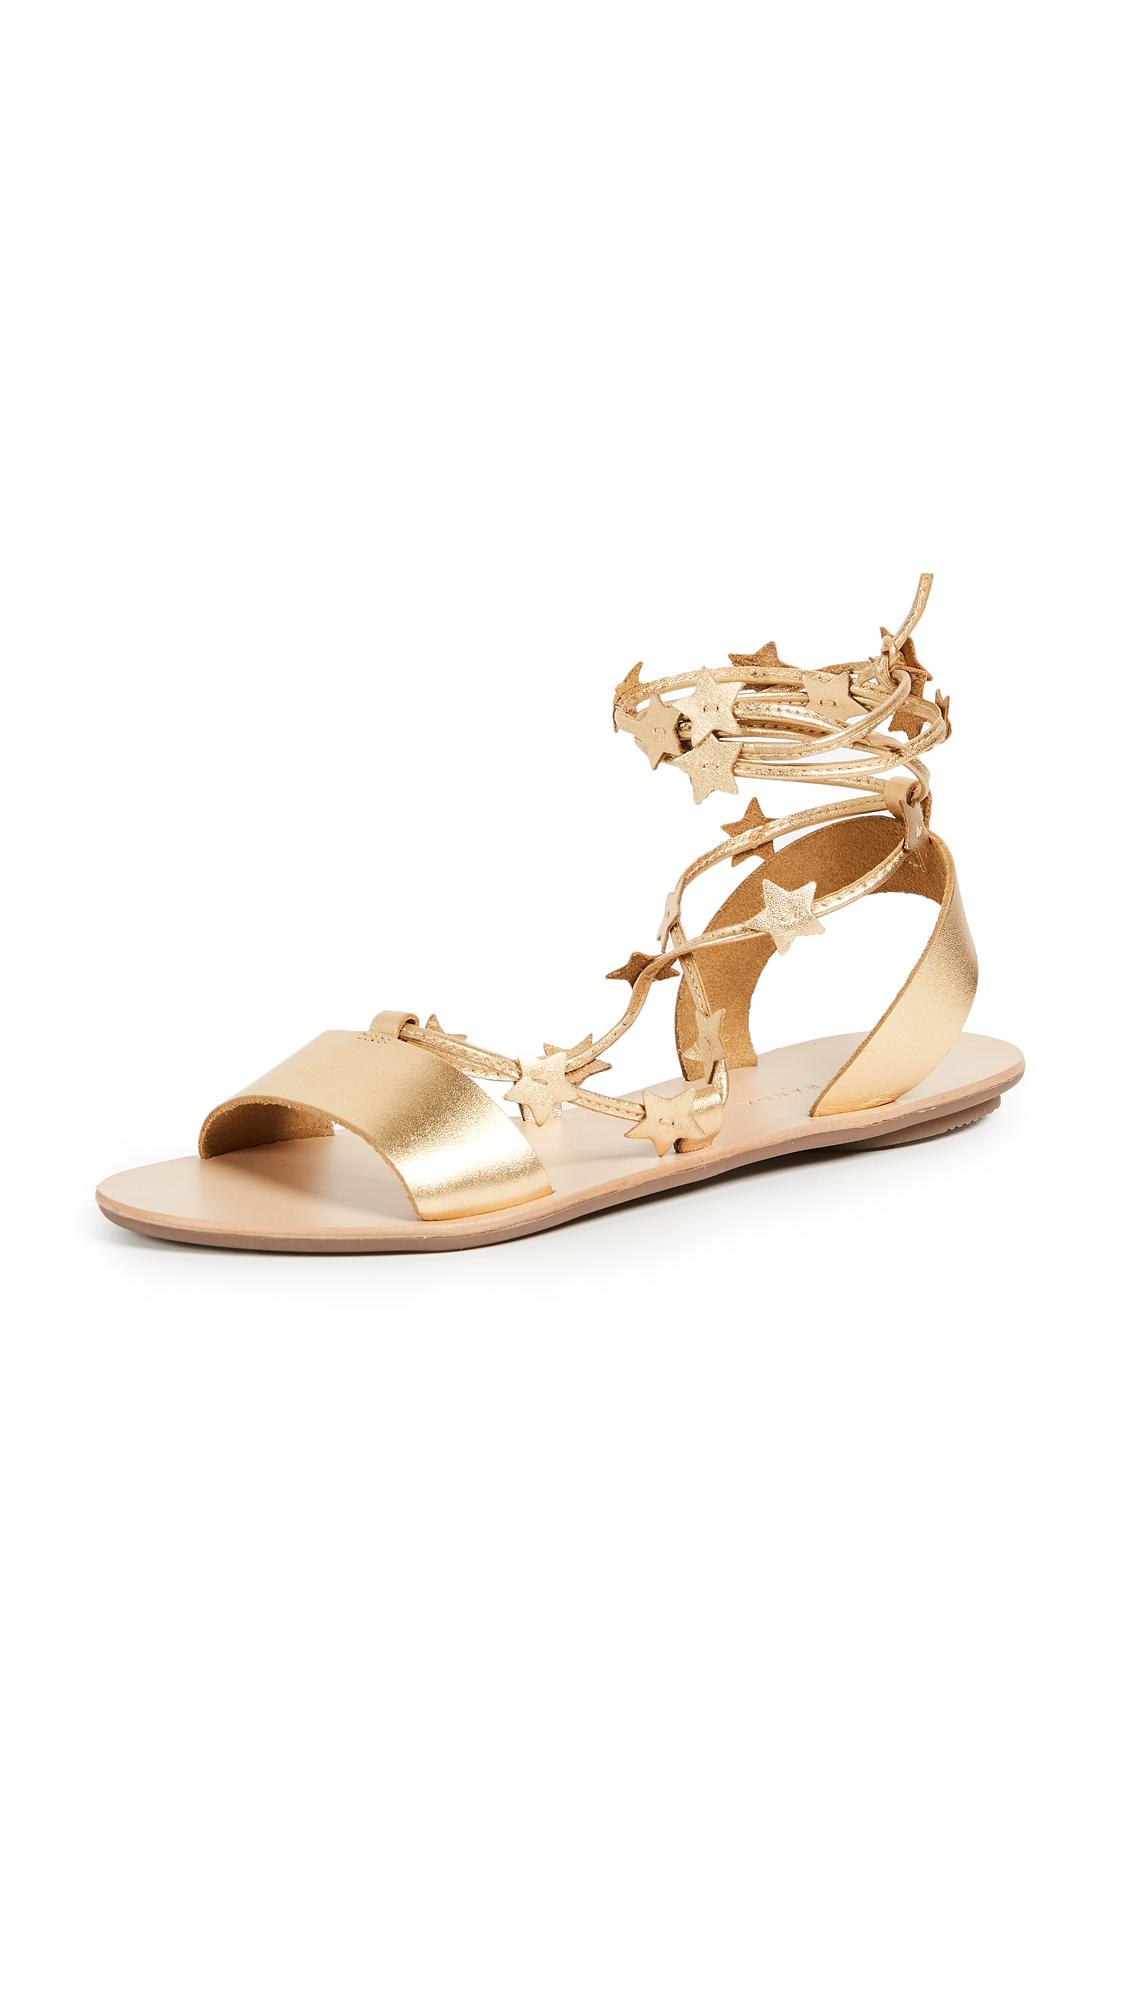 Loeffler Randall Starla Flat Sandals - Pale Gold